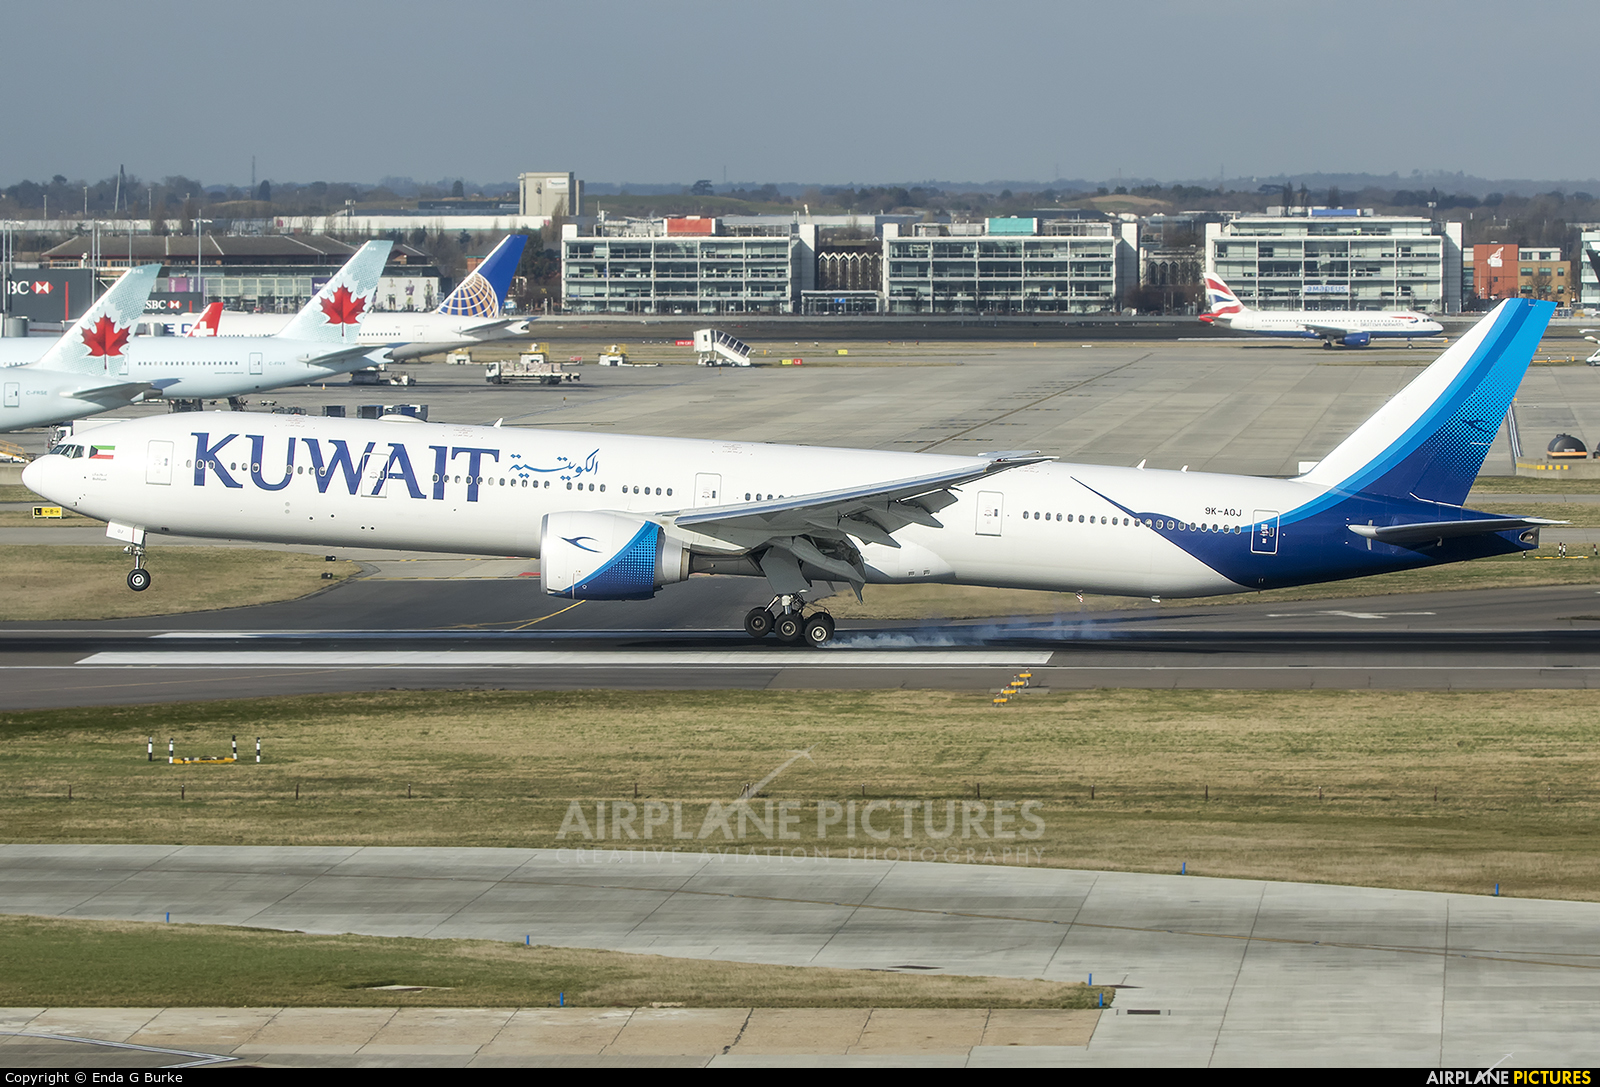 Kuwait Airways 9K-AOJ aircraft at London - Heathrow